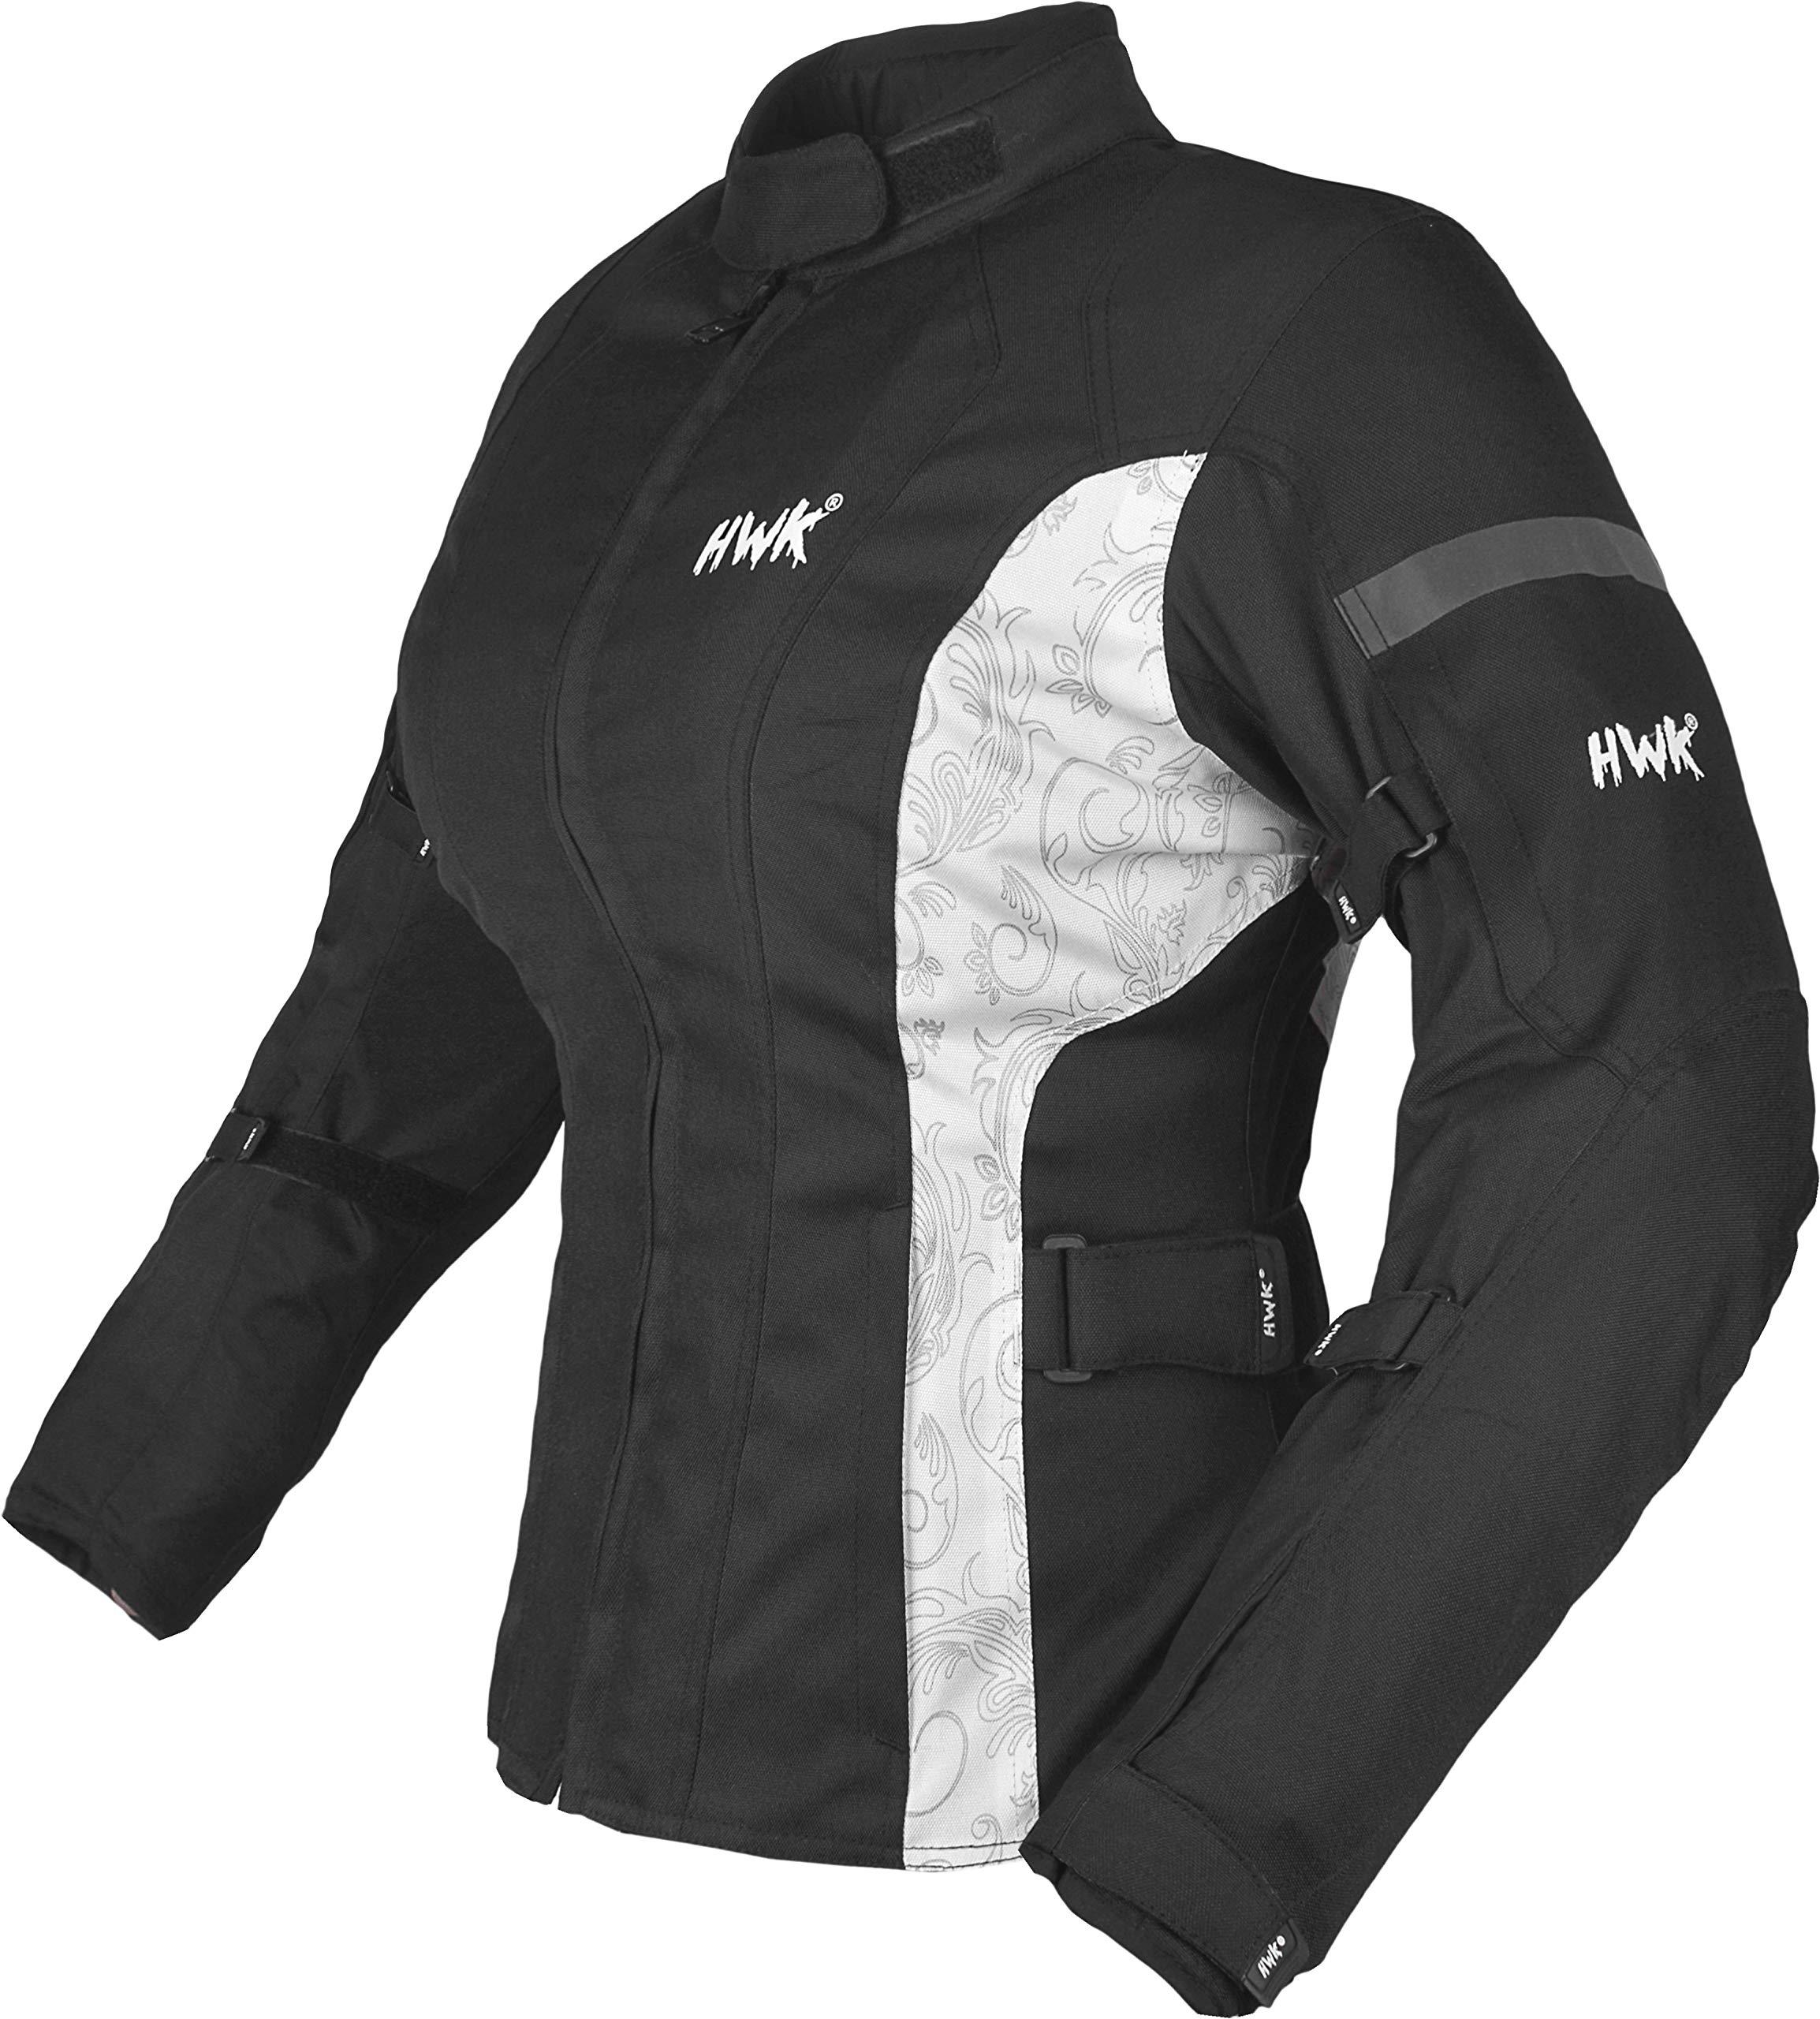 HWK Women's Motorcycle Jacket For Women Rain Waterproof Moto Riding Ladies Motorbike Jackets CE Armored (Black/White, X-Large)